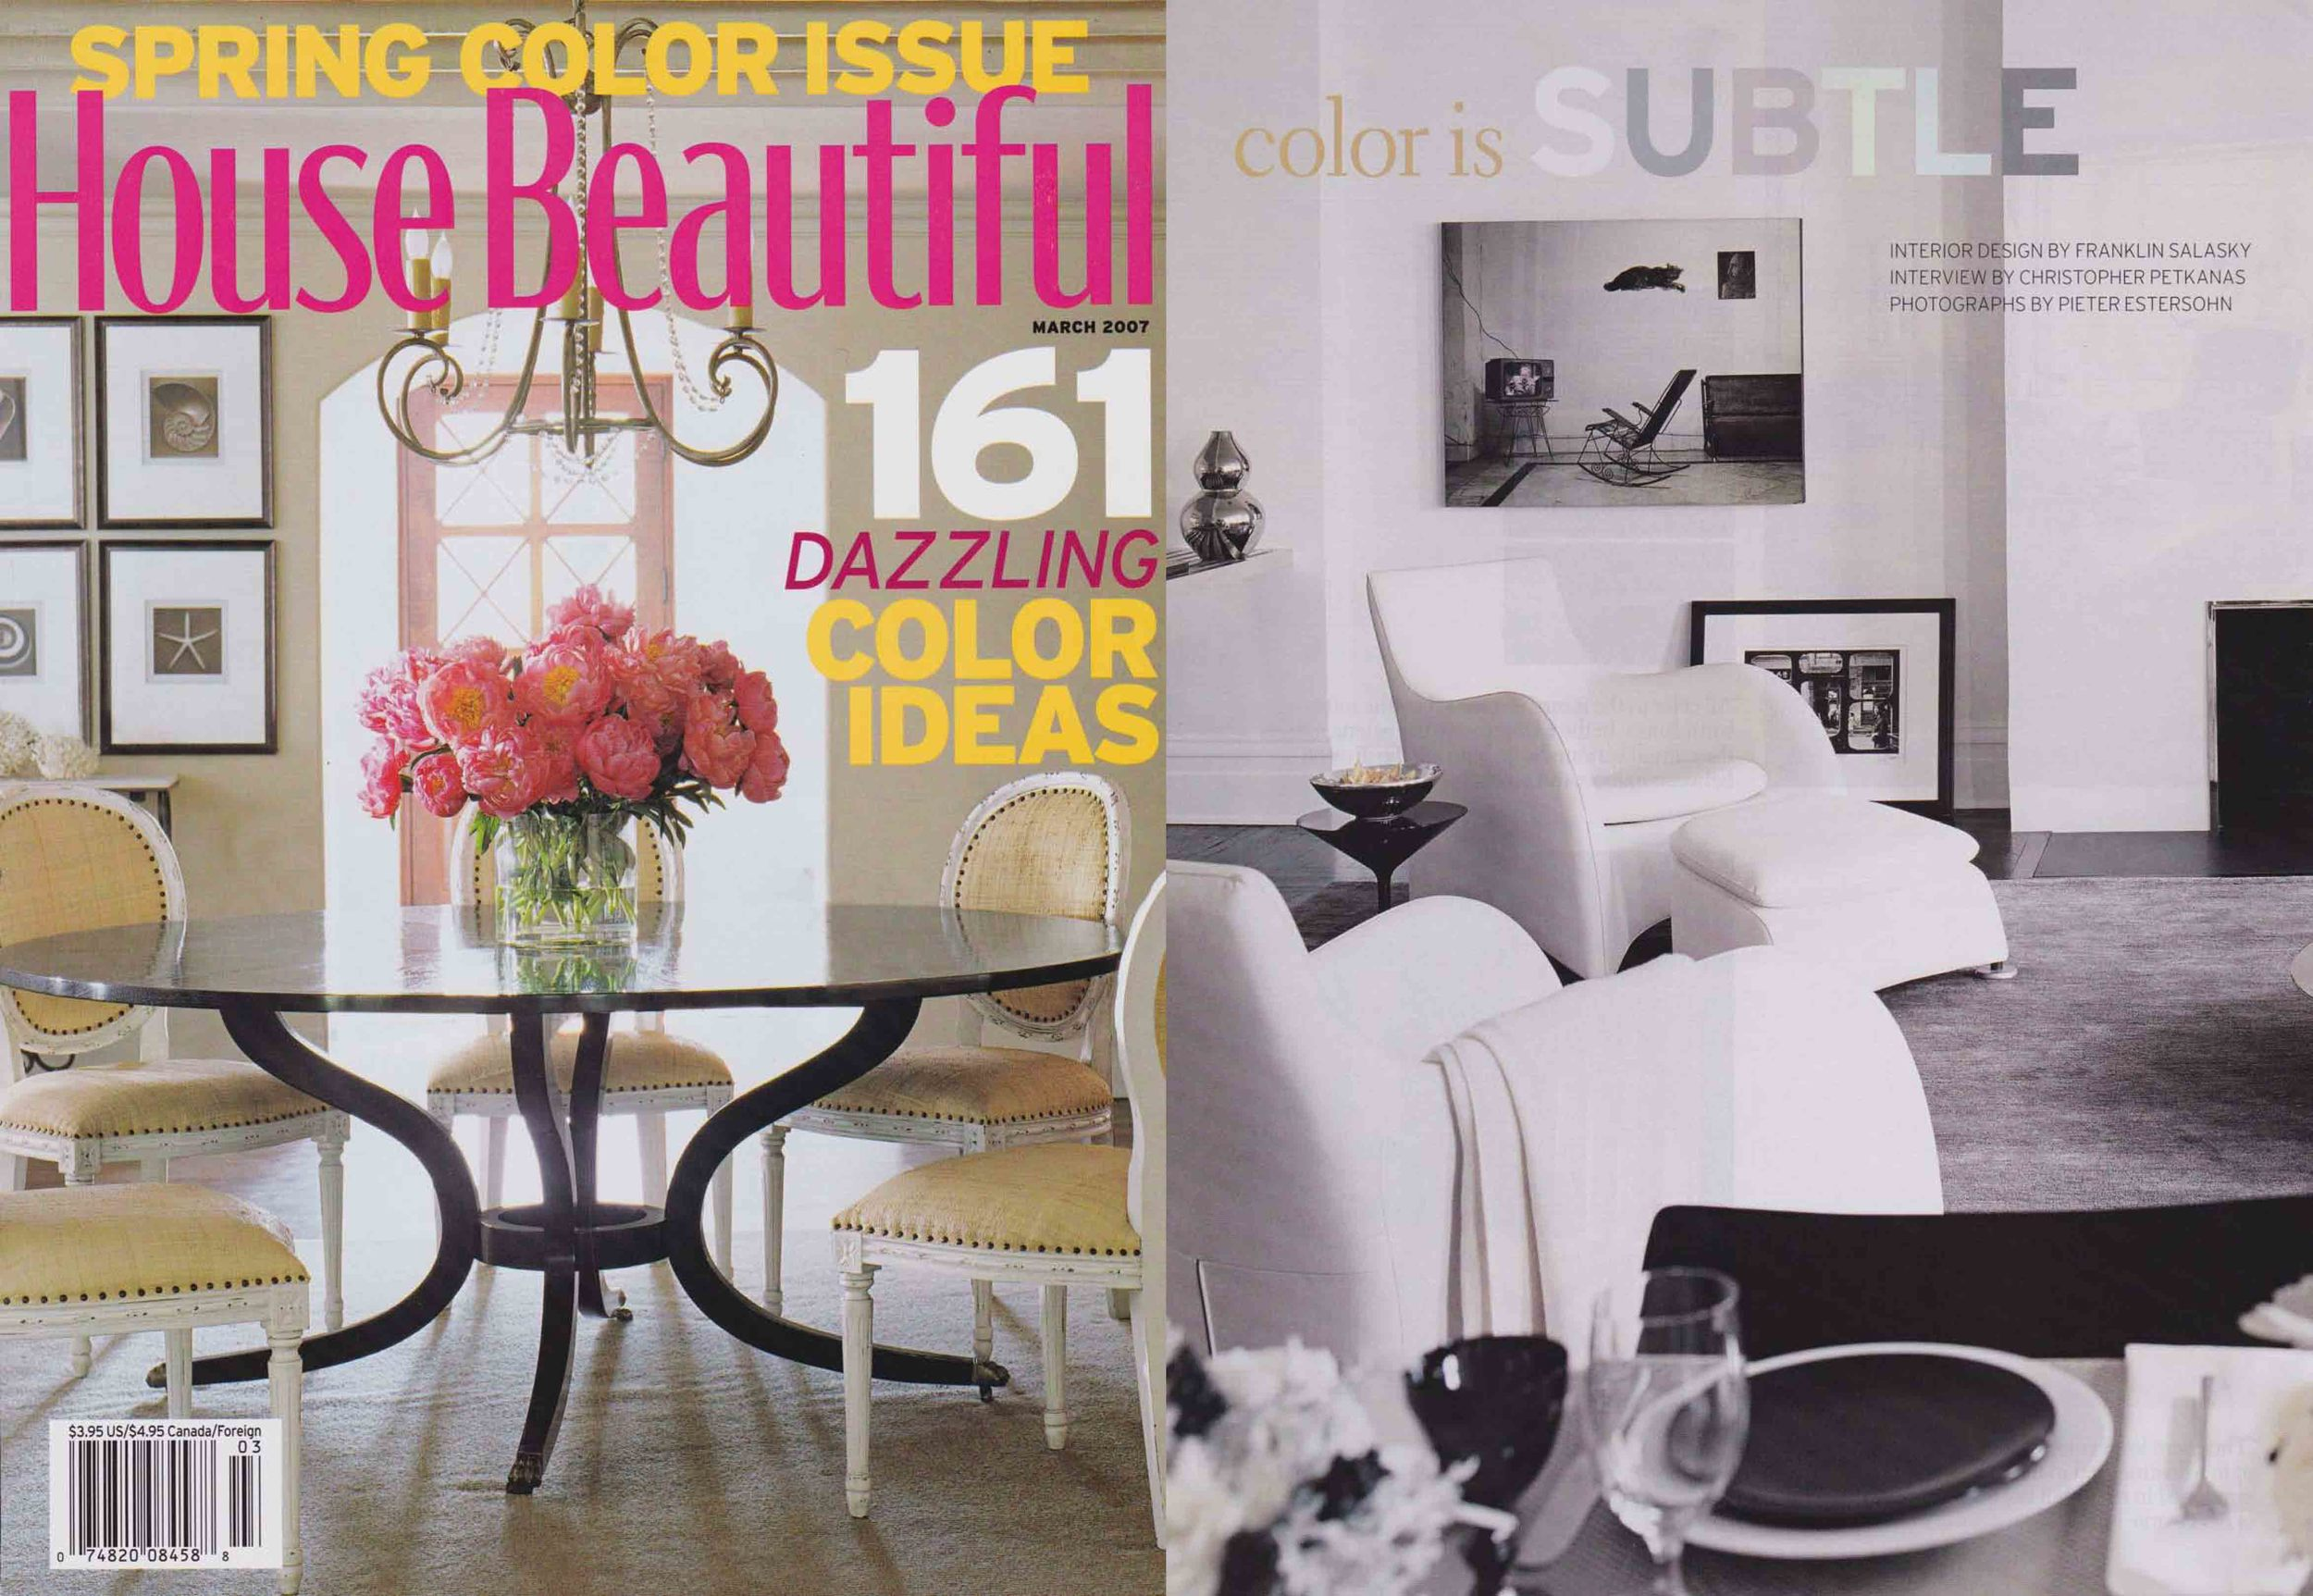 House Beautiful - March 2007.jpg